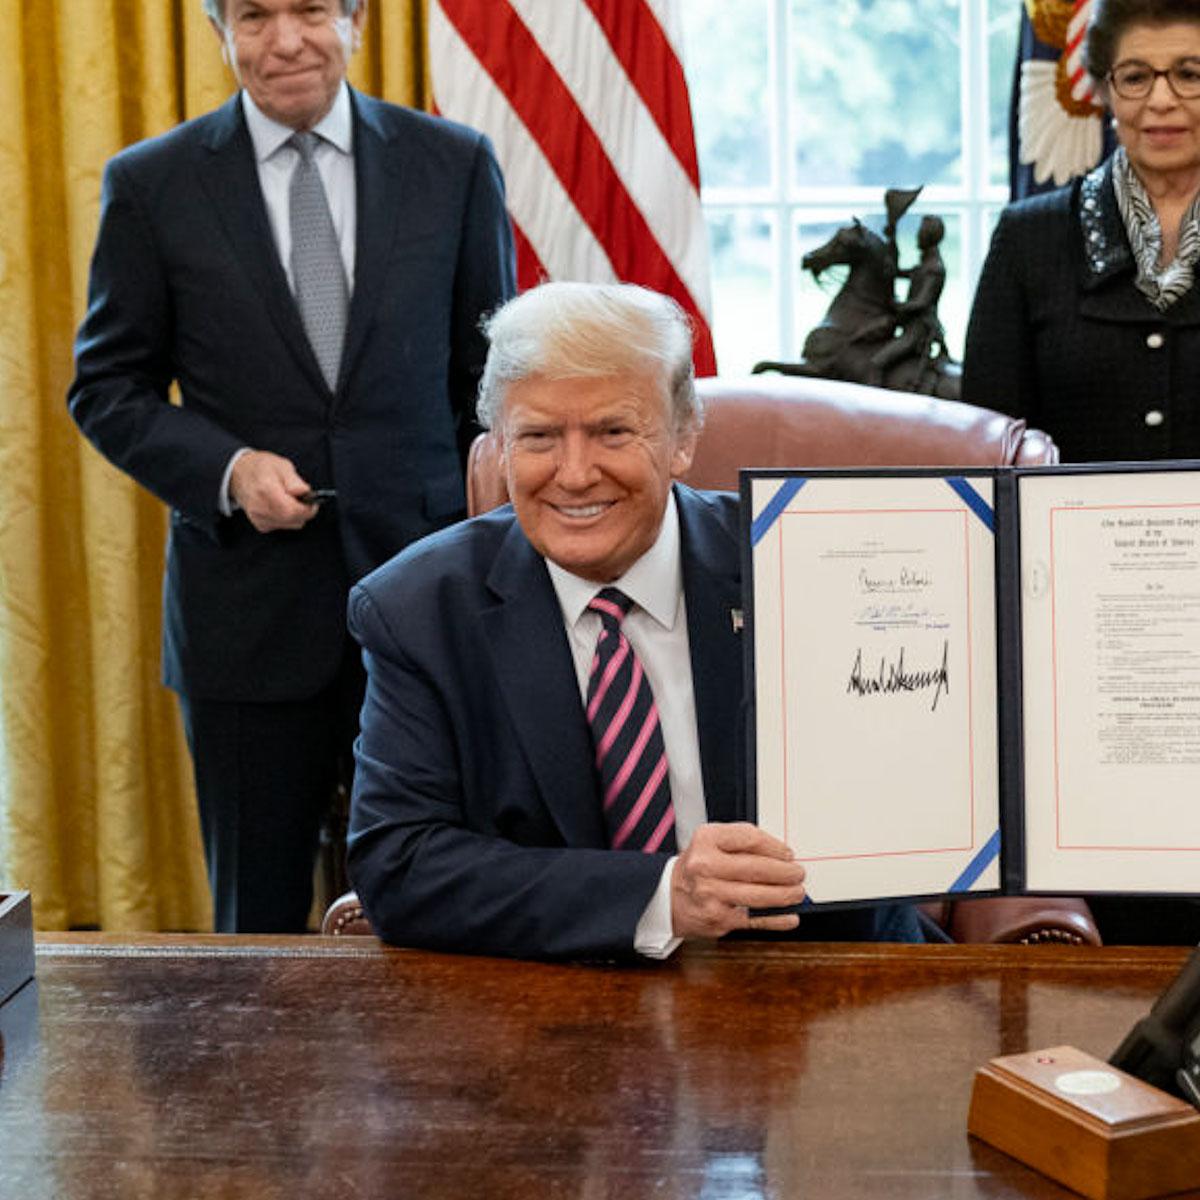 donald-trump-american-president-hair-hairstyle-mens-hair-loss-grooming-man-for-himself-2